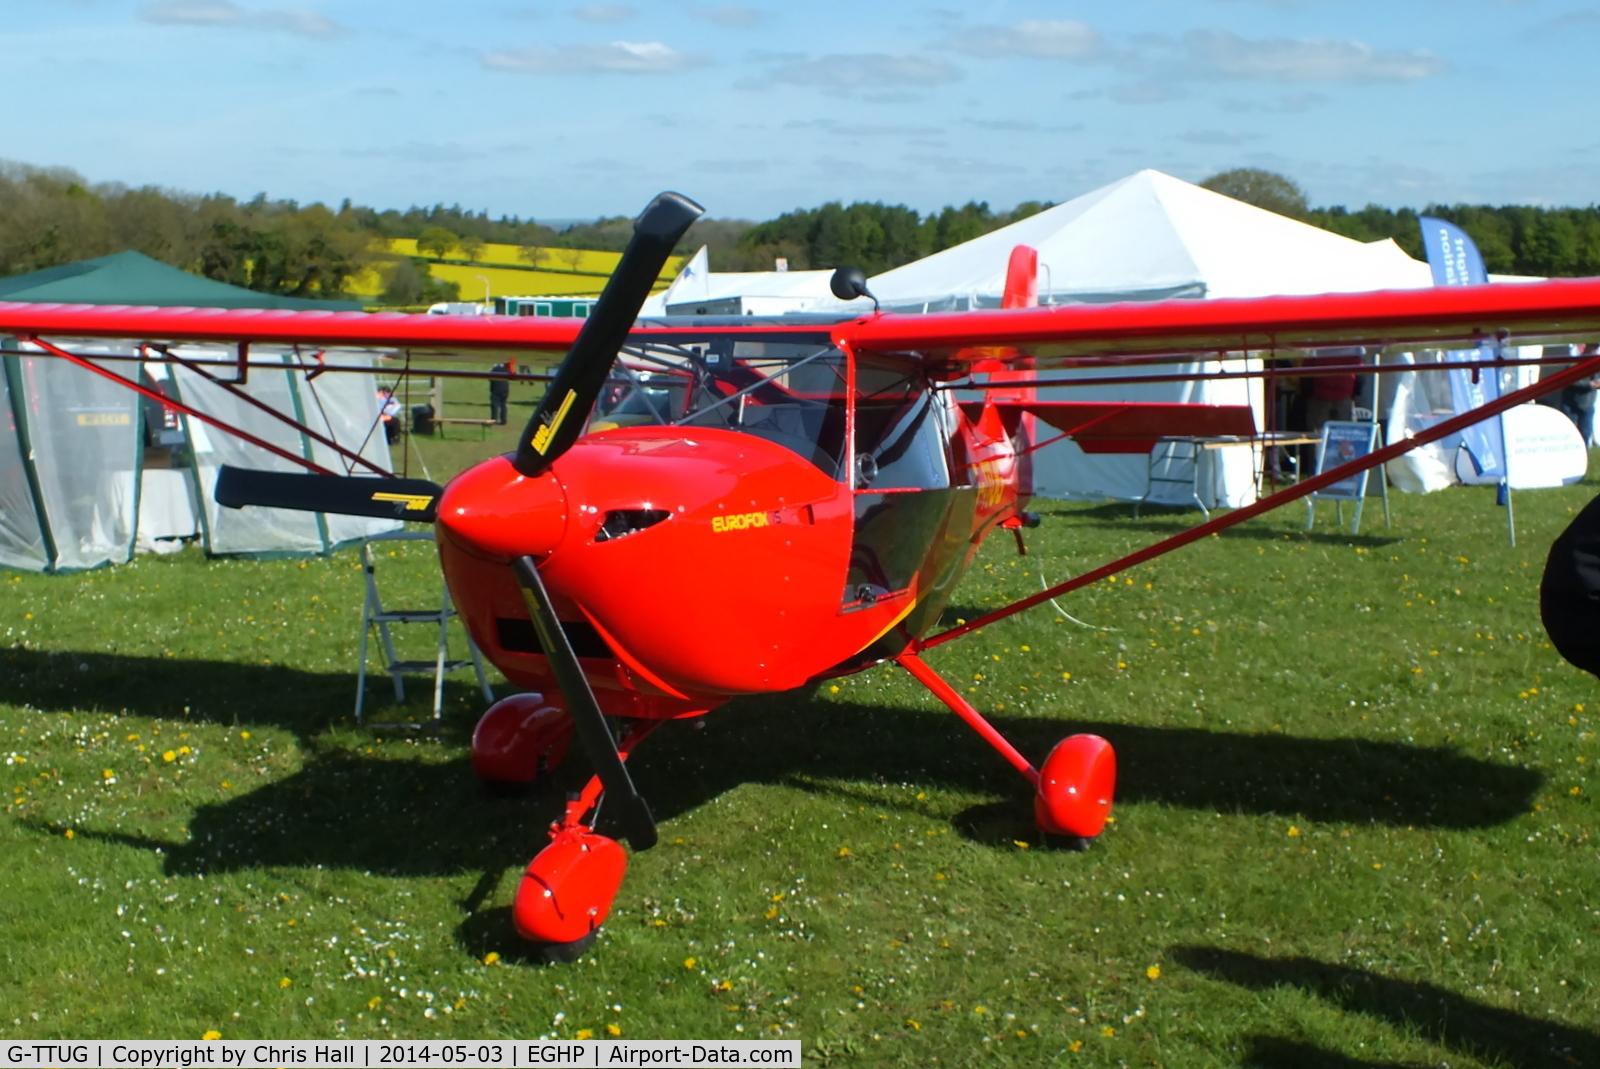 G-TTUG, 2013 Aeropro Eurofox 912(S) C/N LAA 376-15213, at the 2014 Microlight Trade Fair, Popham